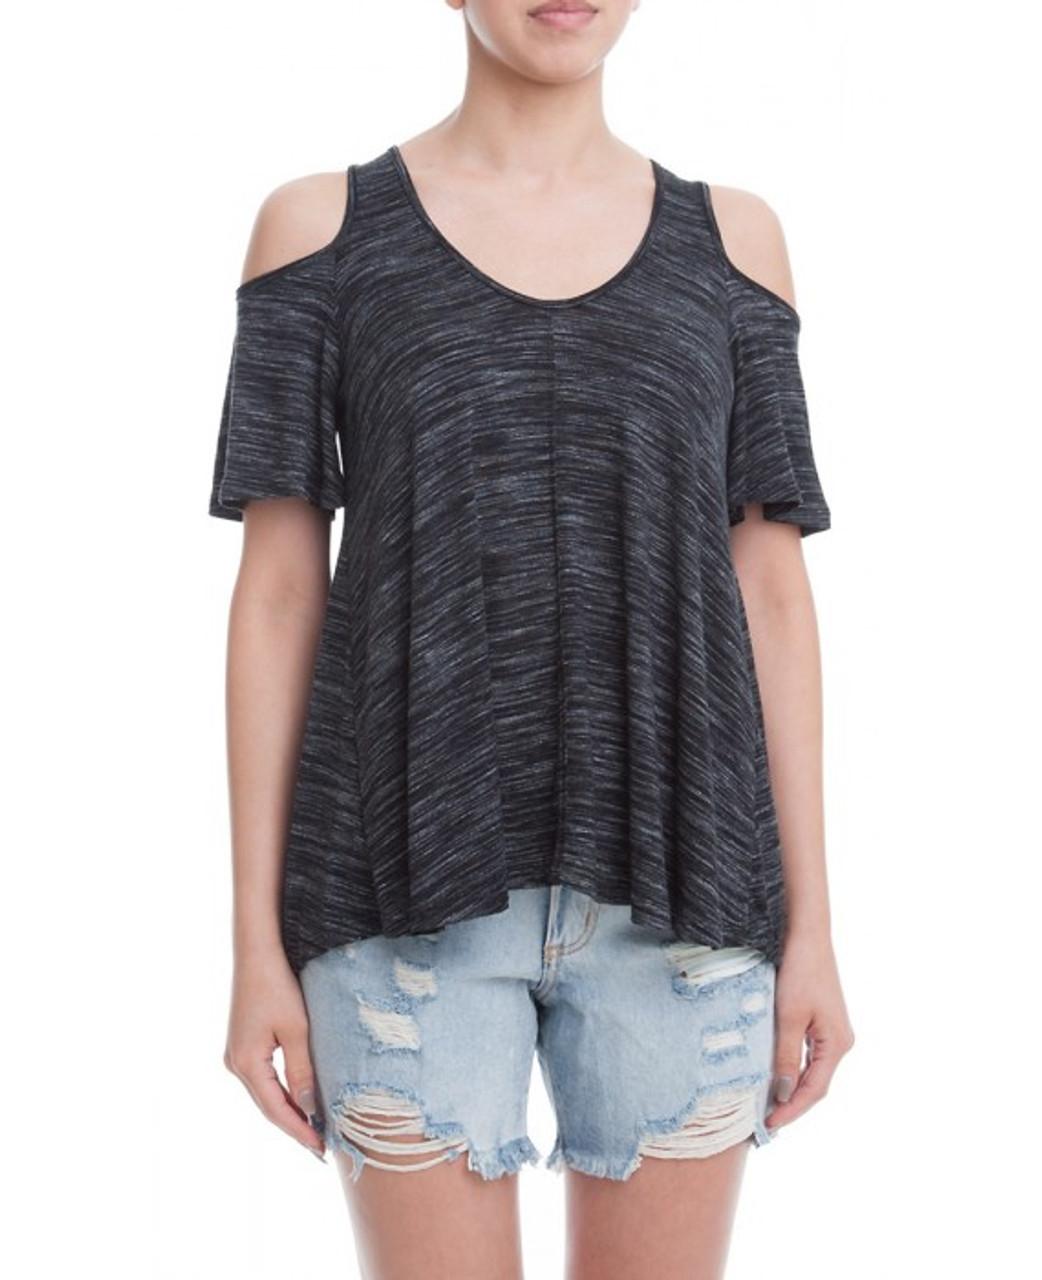 53a7f56e0f2e6 Charcoal Short Sleeve Open Shoulder Top - Longhorn Fashions